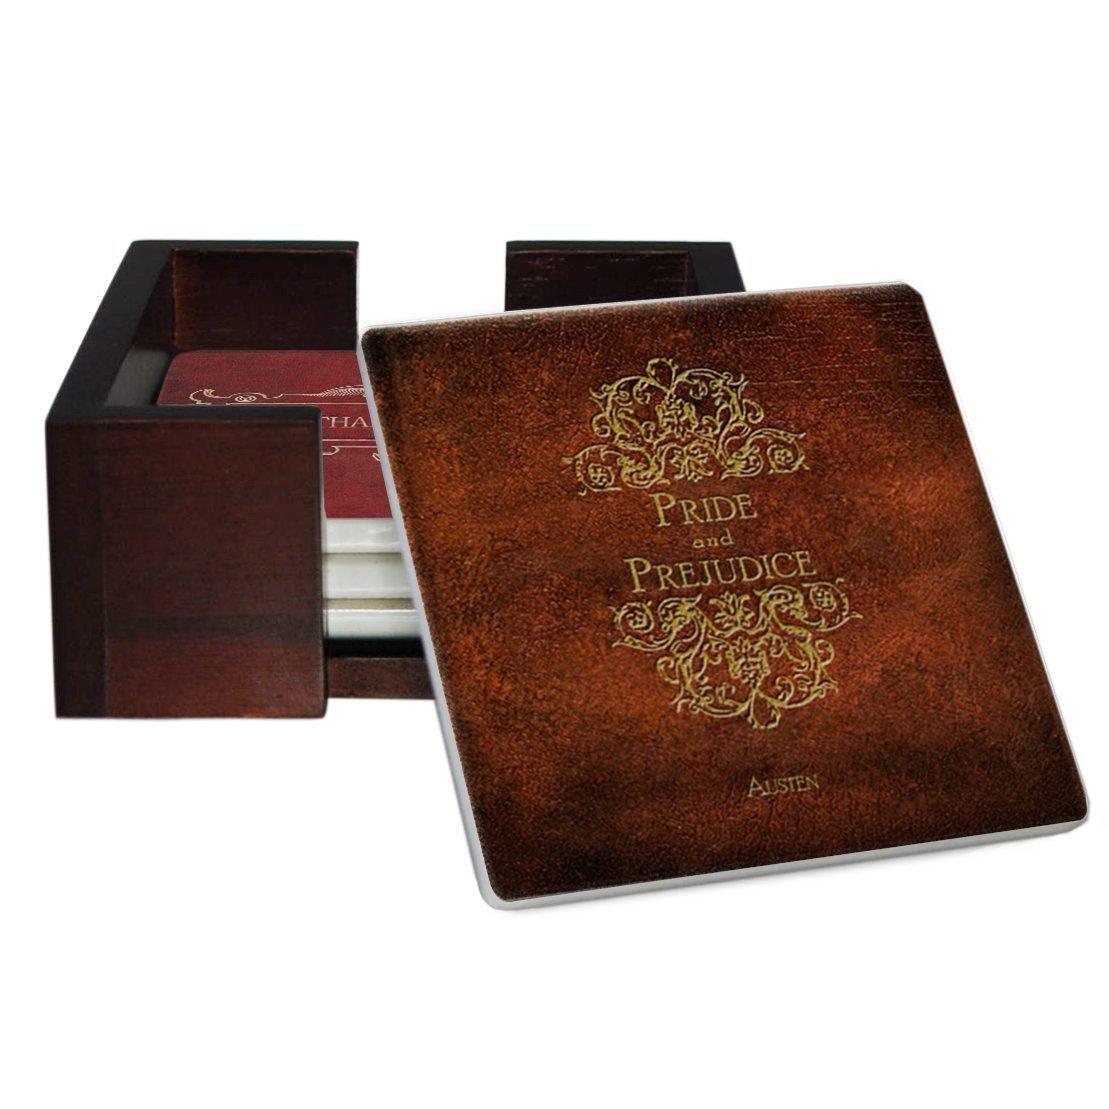 Jane Austen Popular popular Books Coaster Set - Back with Sandstone Same day shipping Cork Tile